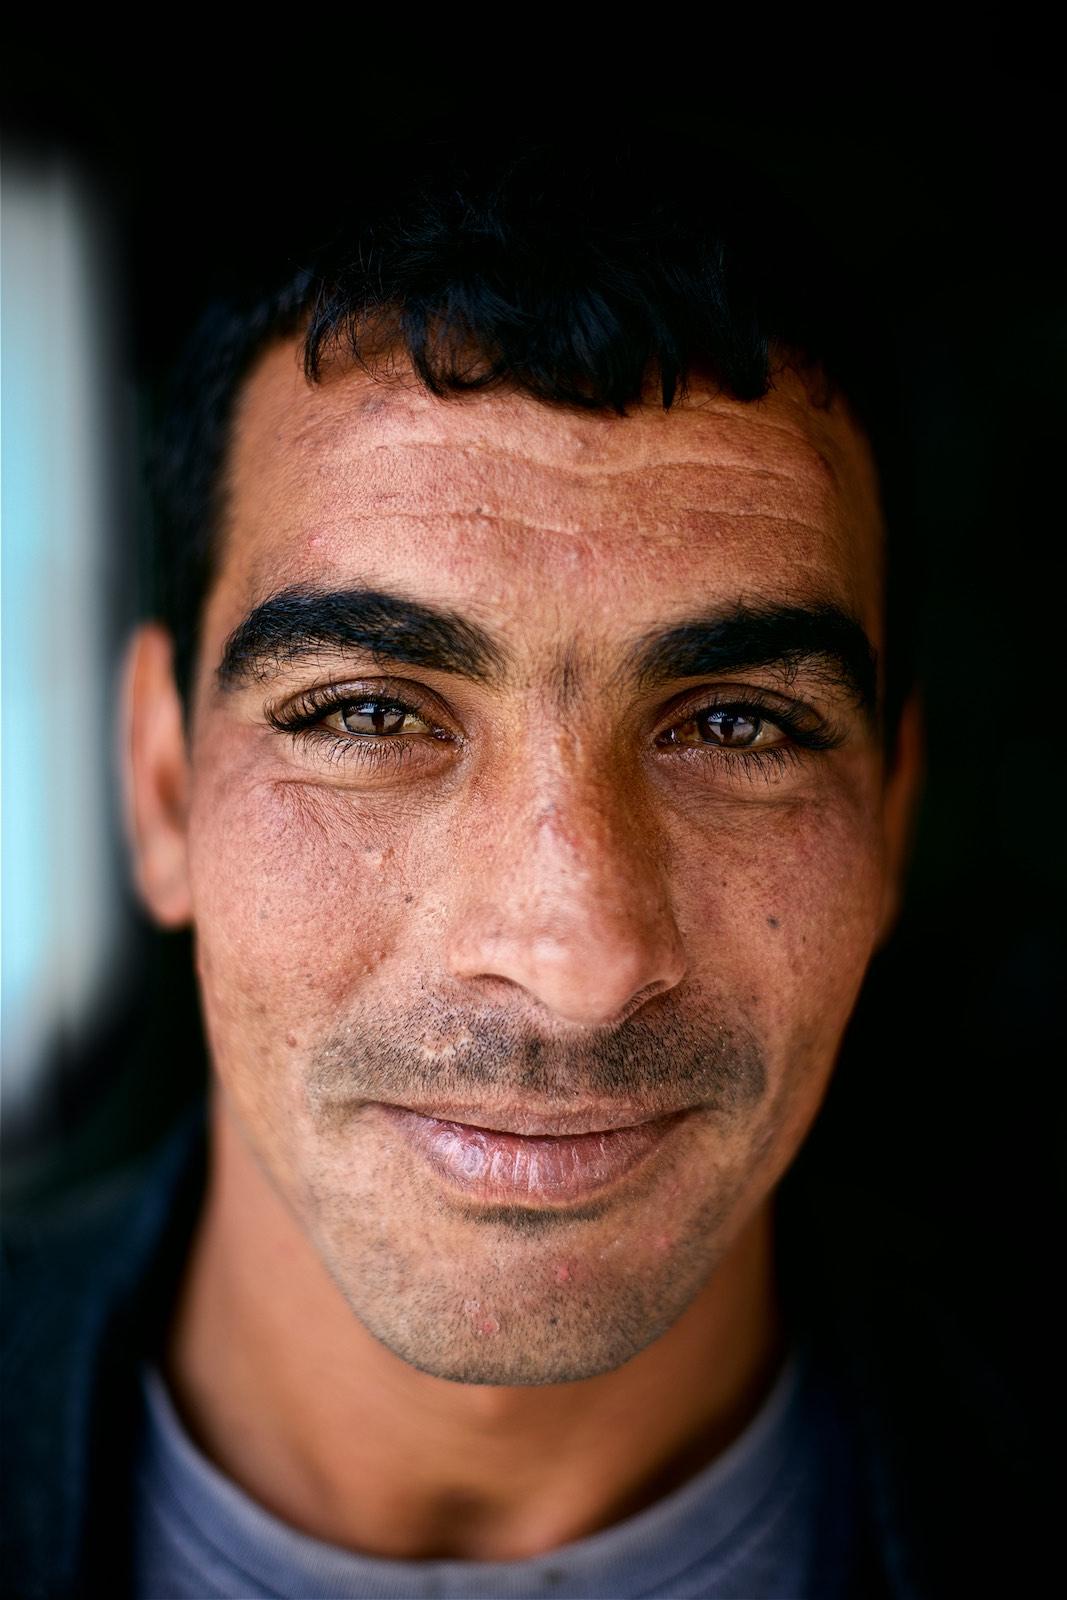 denis-bosnic-zaatari-refugee-camp-syria-jordan- (3).jpg